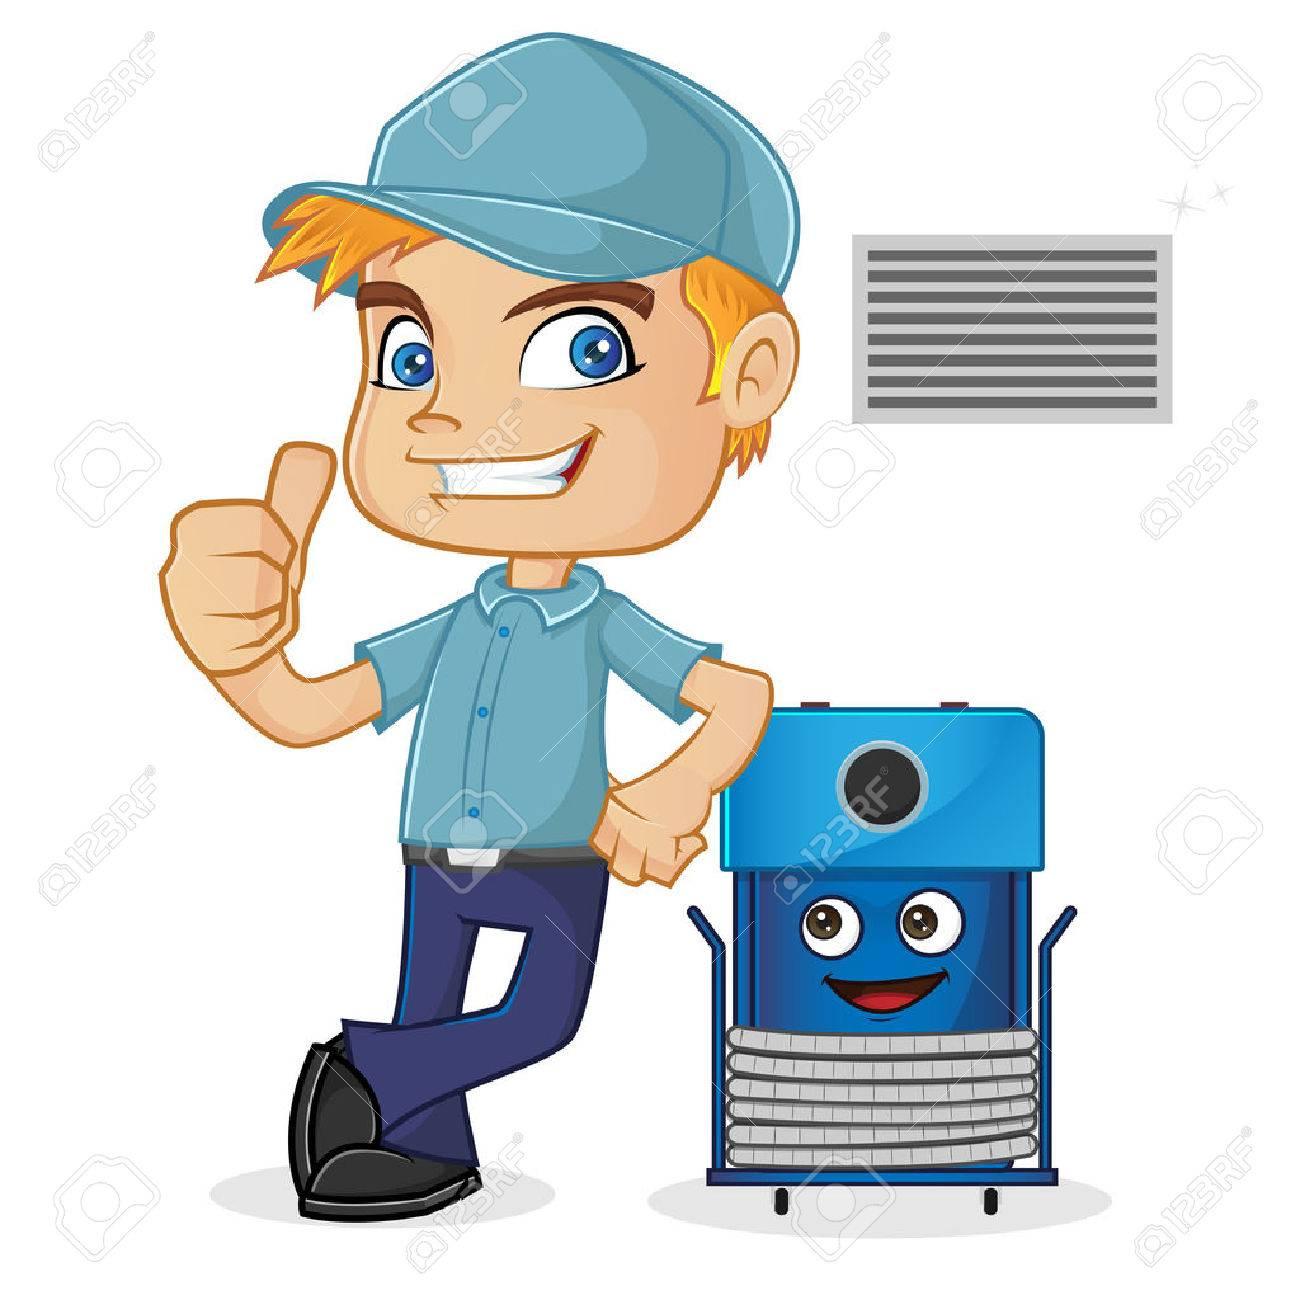 hvac technician leaning on cleaning machine royalty free cliparts rh 123rf com HVAC Graphics HVAC Cartoon Clip Art